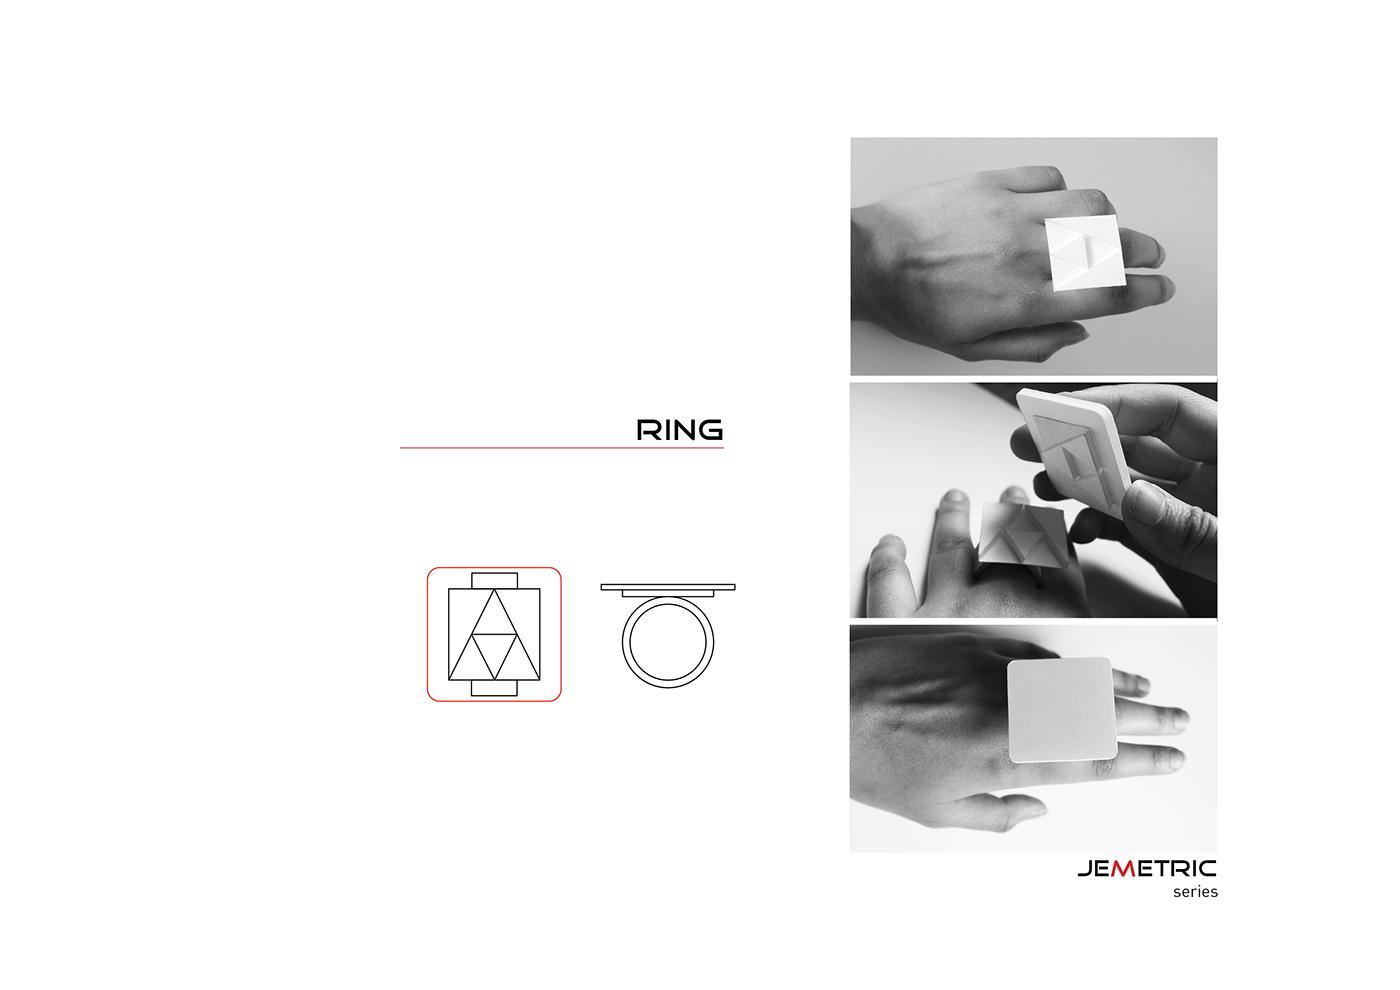 concept design design modeling industrial design  product design  Jewellery